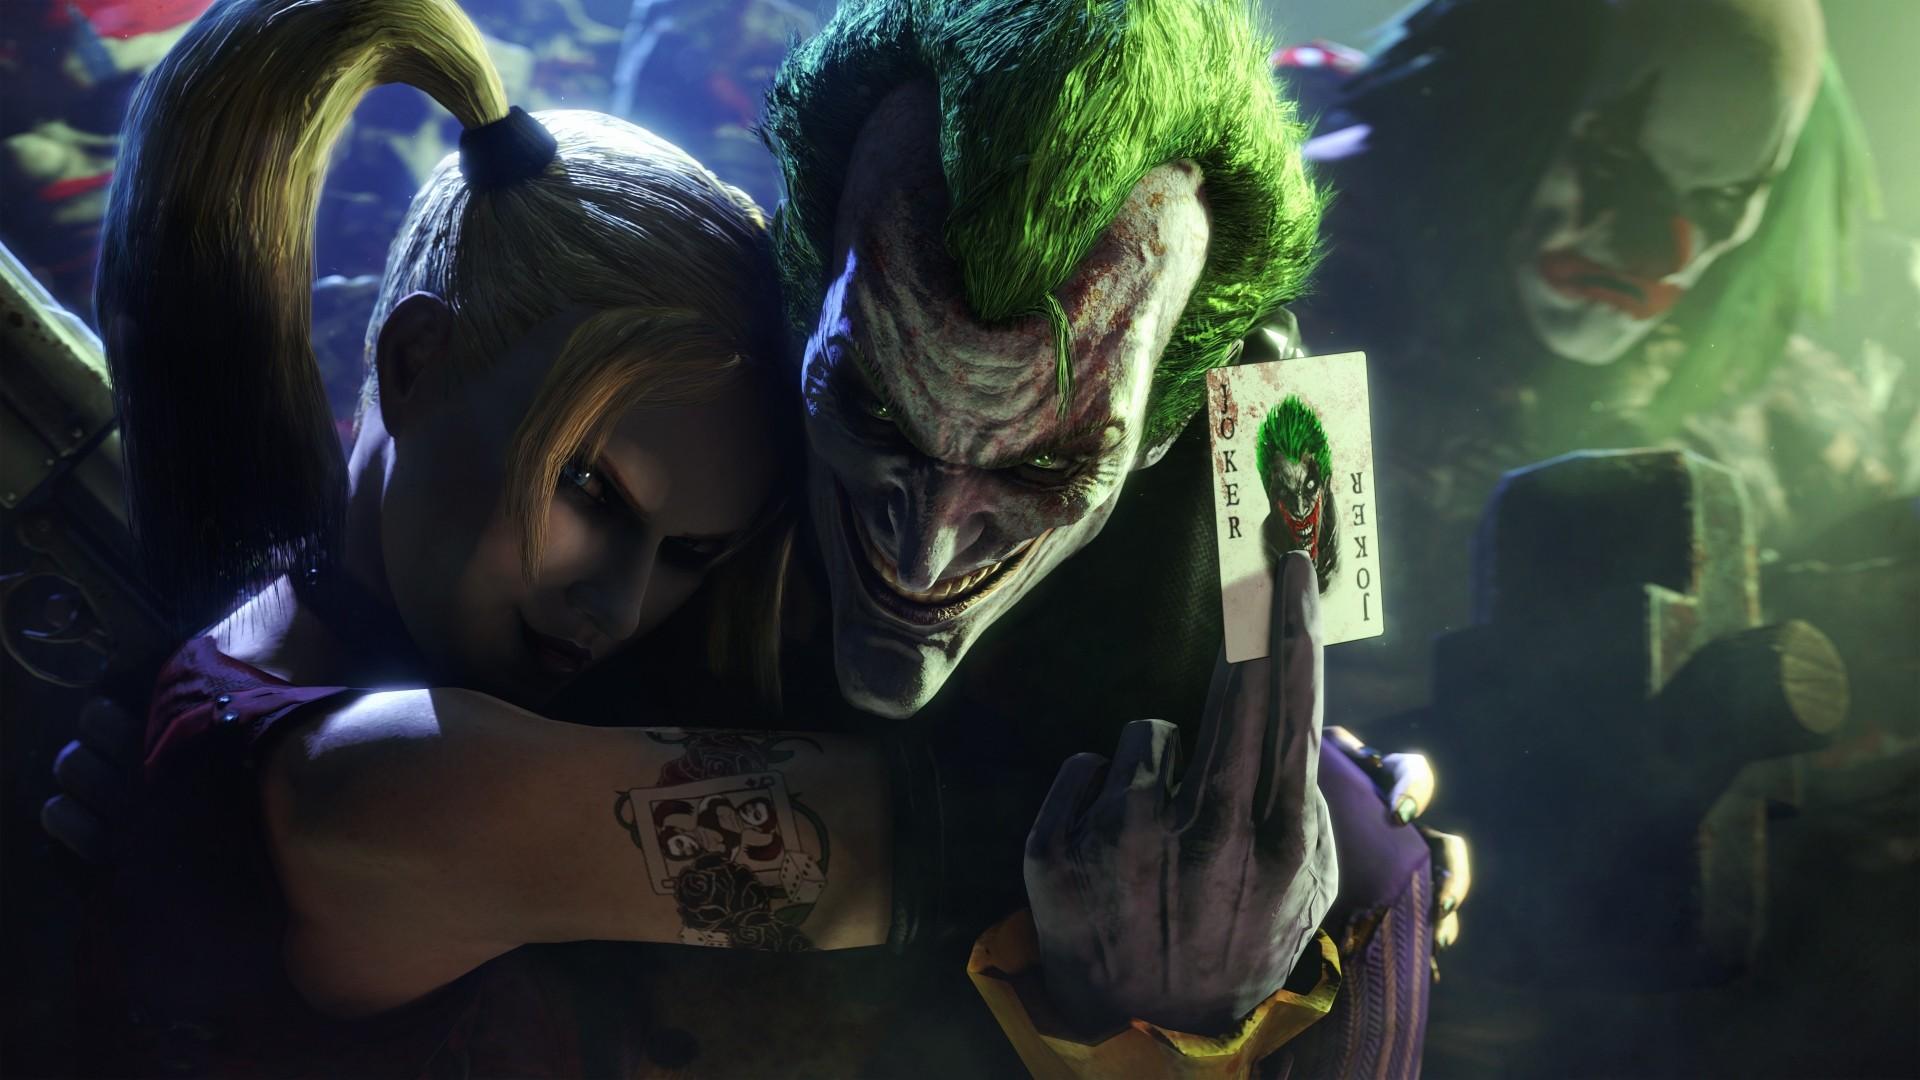 Wallpaper batman, arkham city, joker, harley quinn